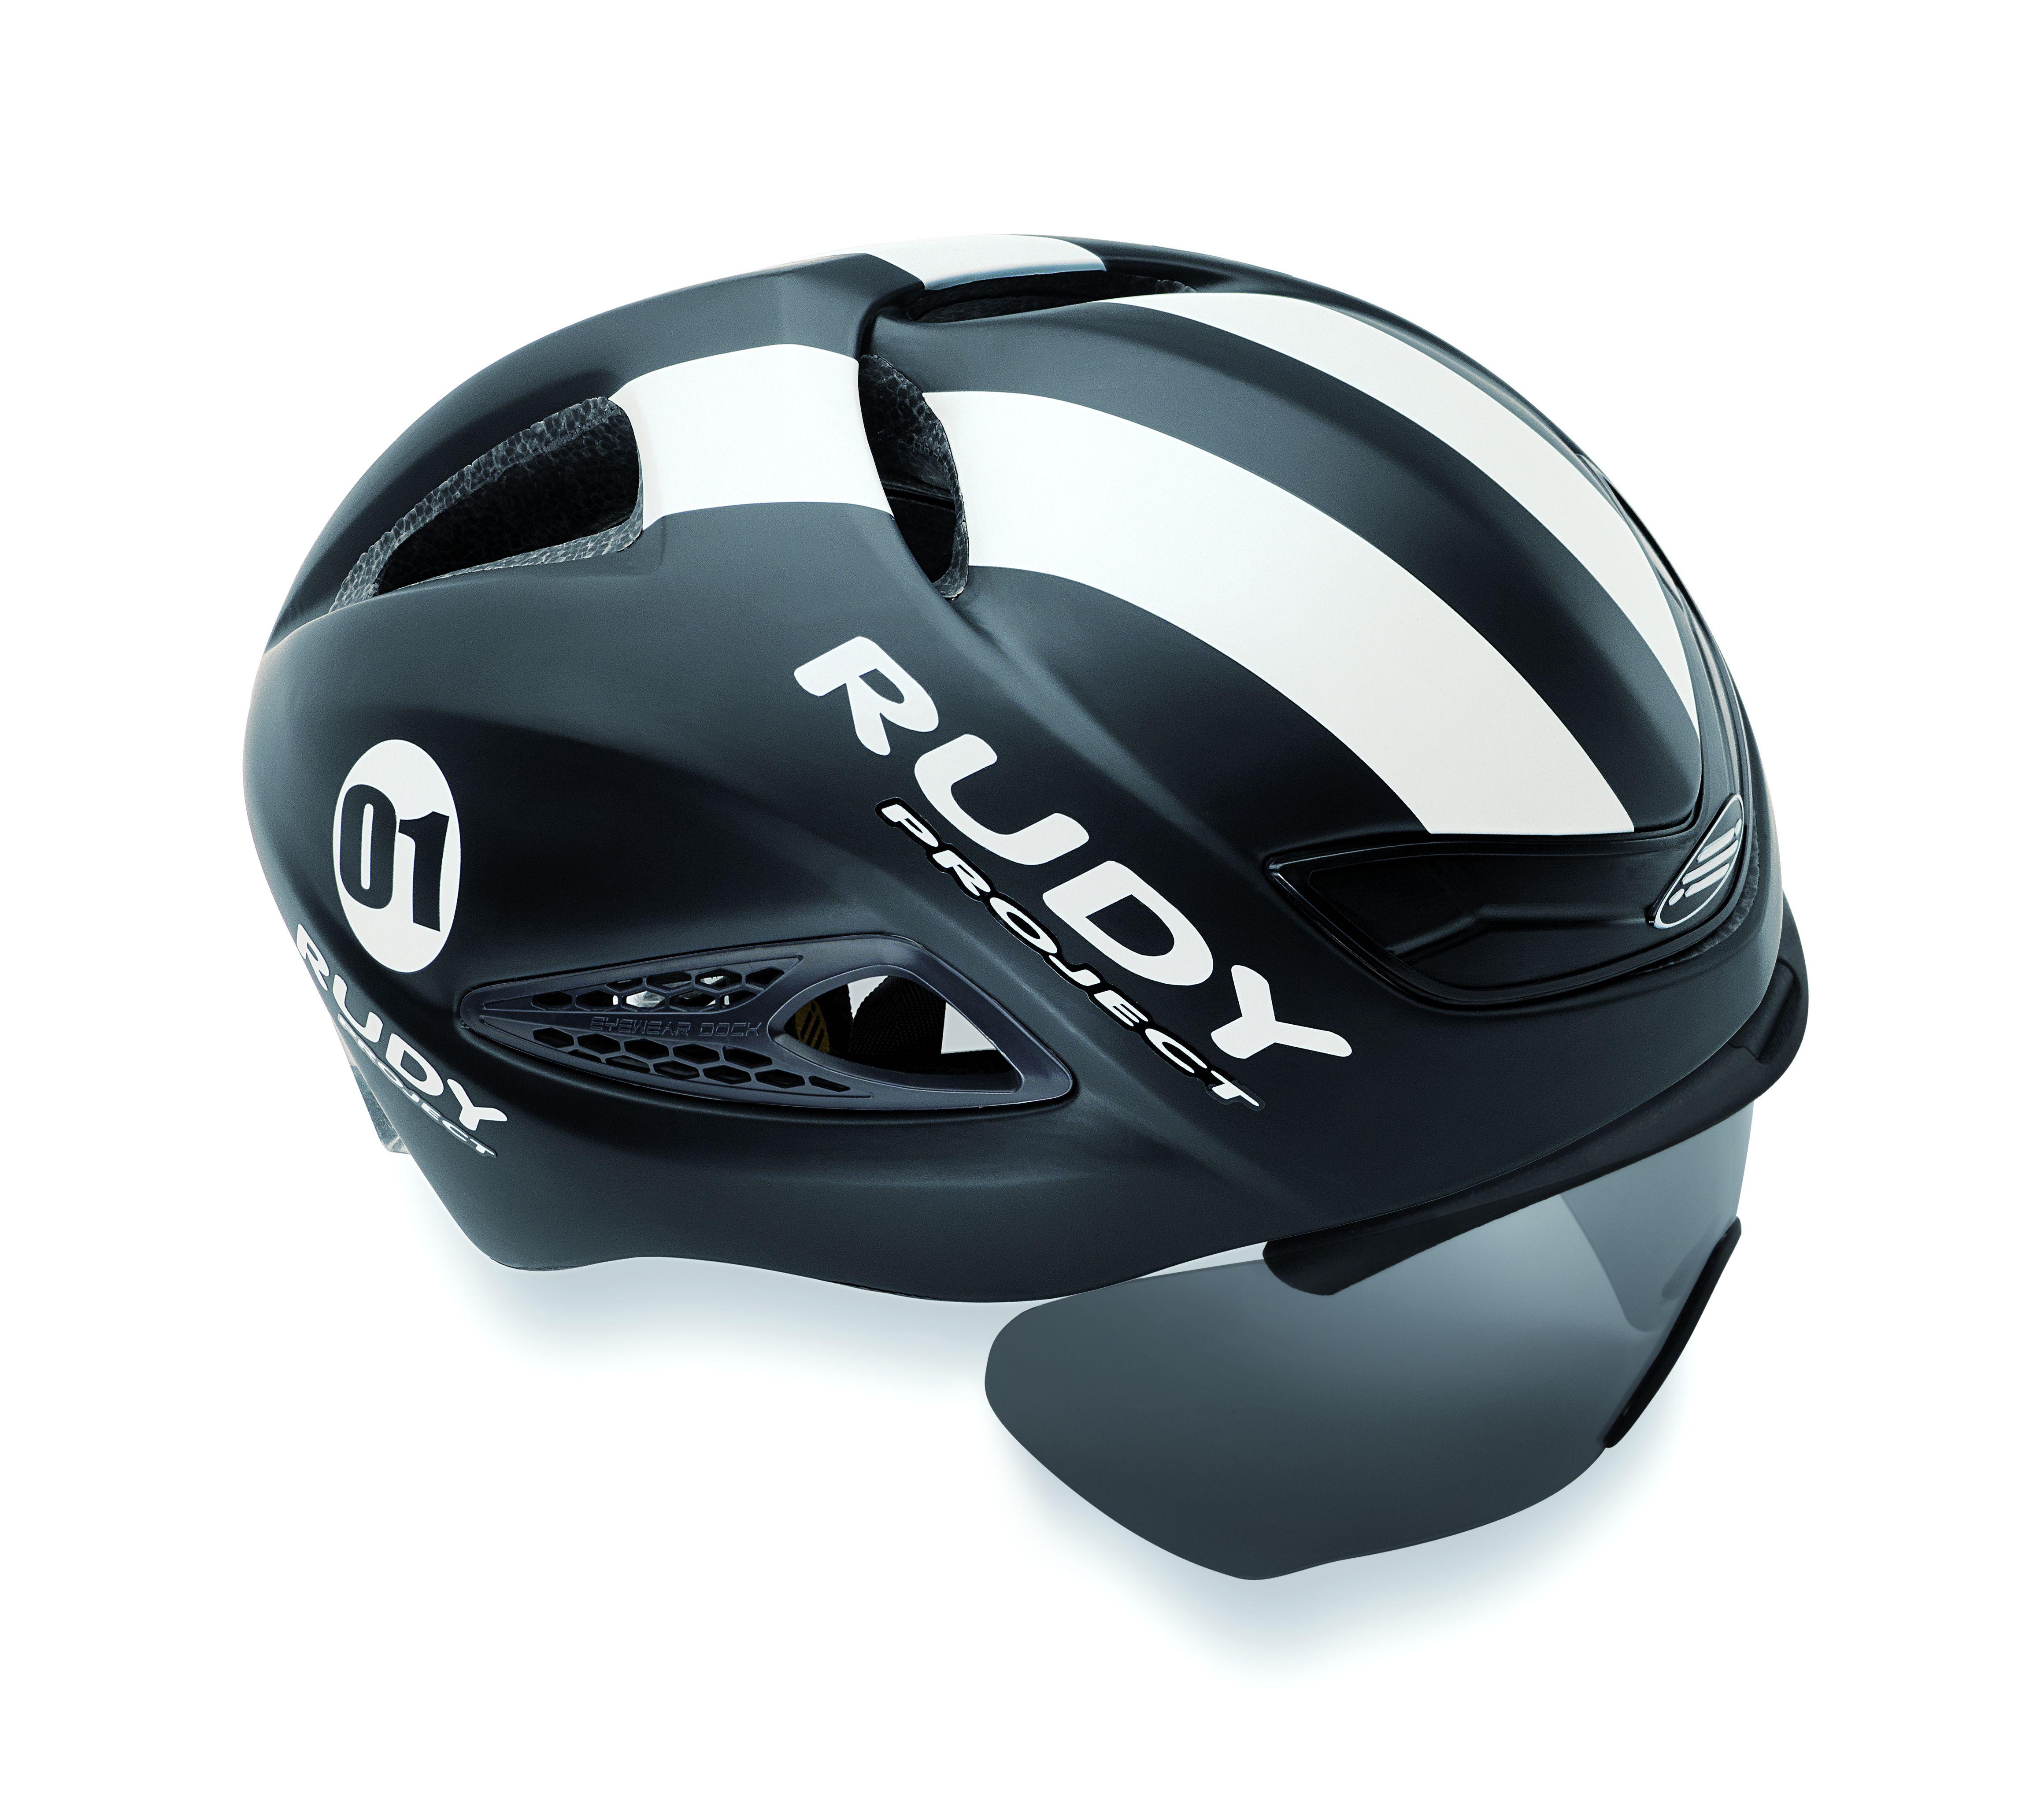 Rudy Project Boost 01 - Cykelhjelm - Mat Sort/Hvid | Hjelme